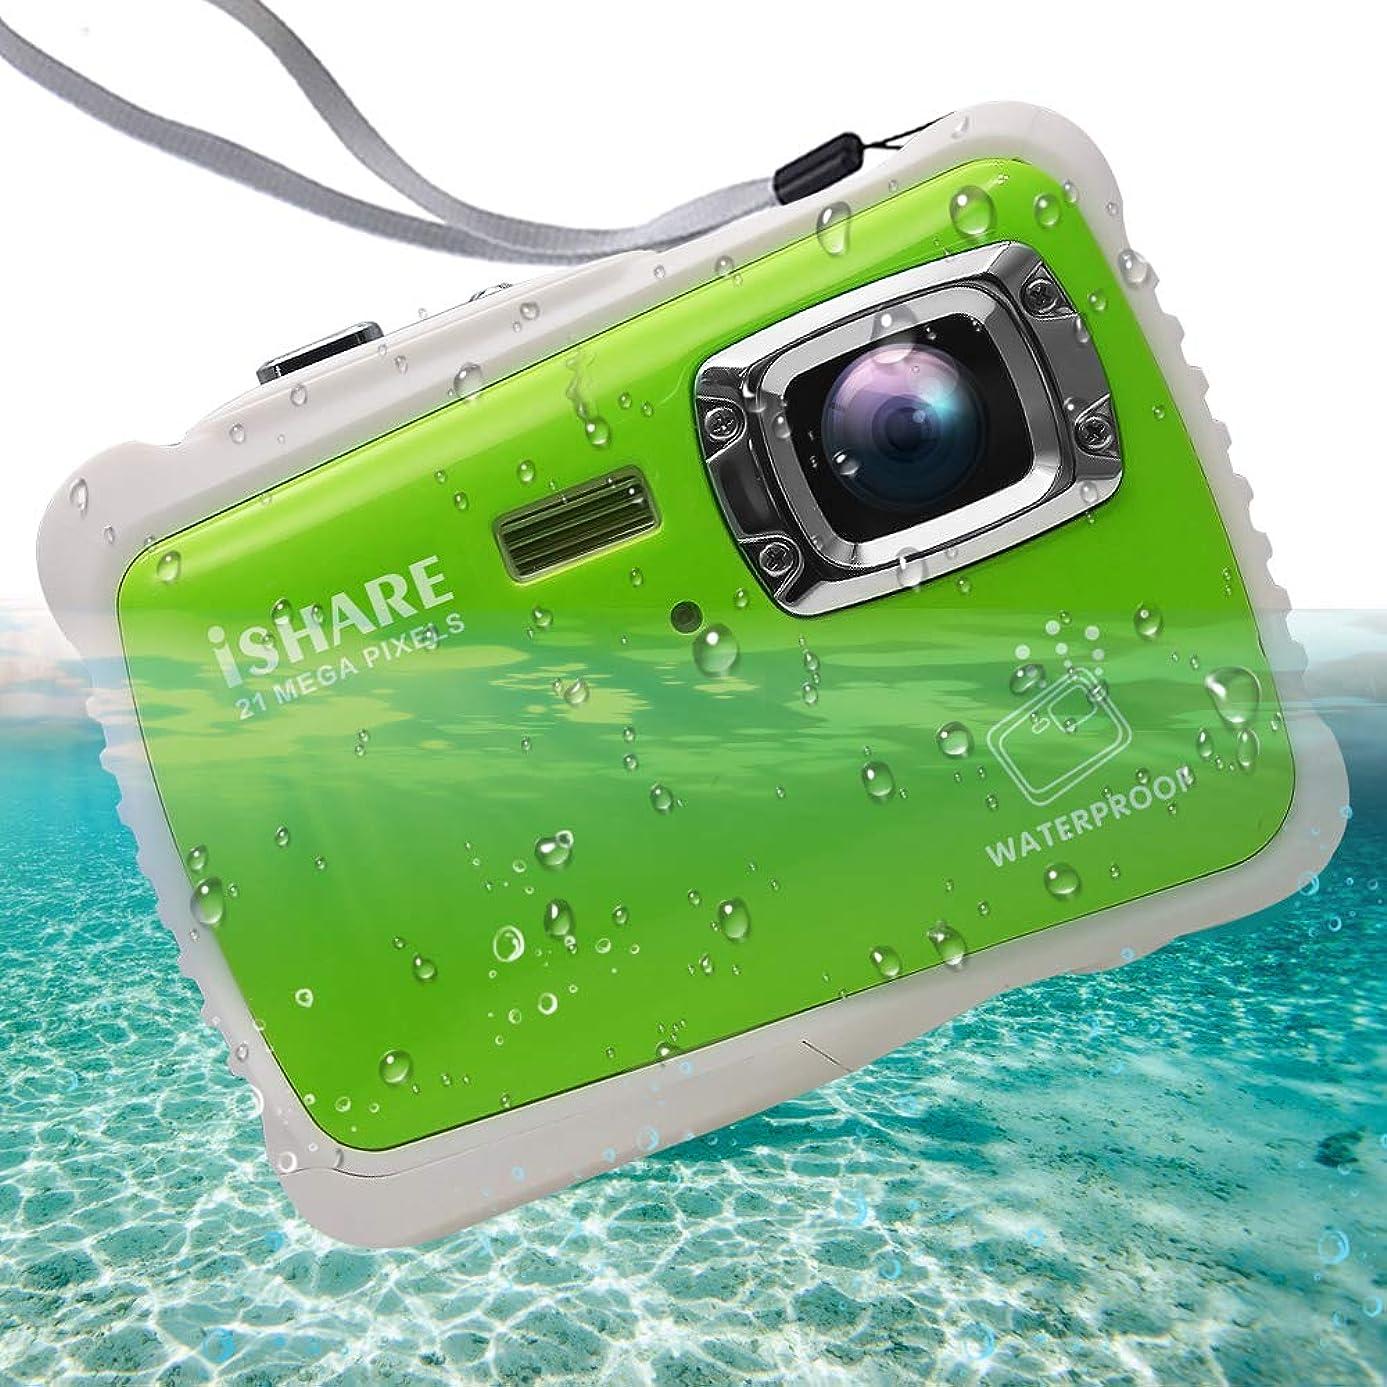 Waterproof Digital Camera for Kids, ishare Update Underwater Camera with 2.0